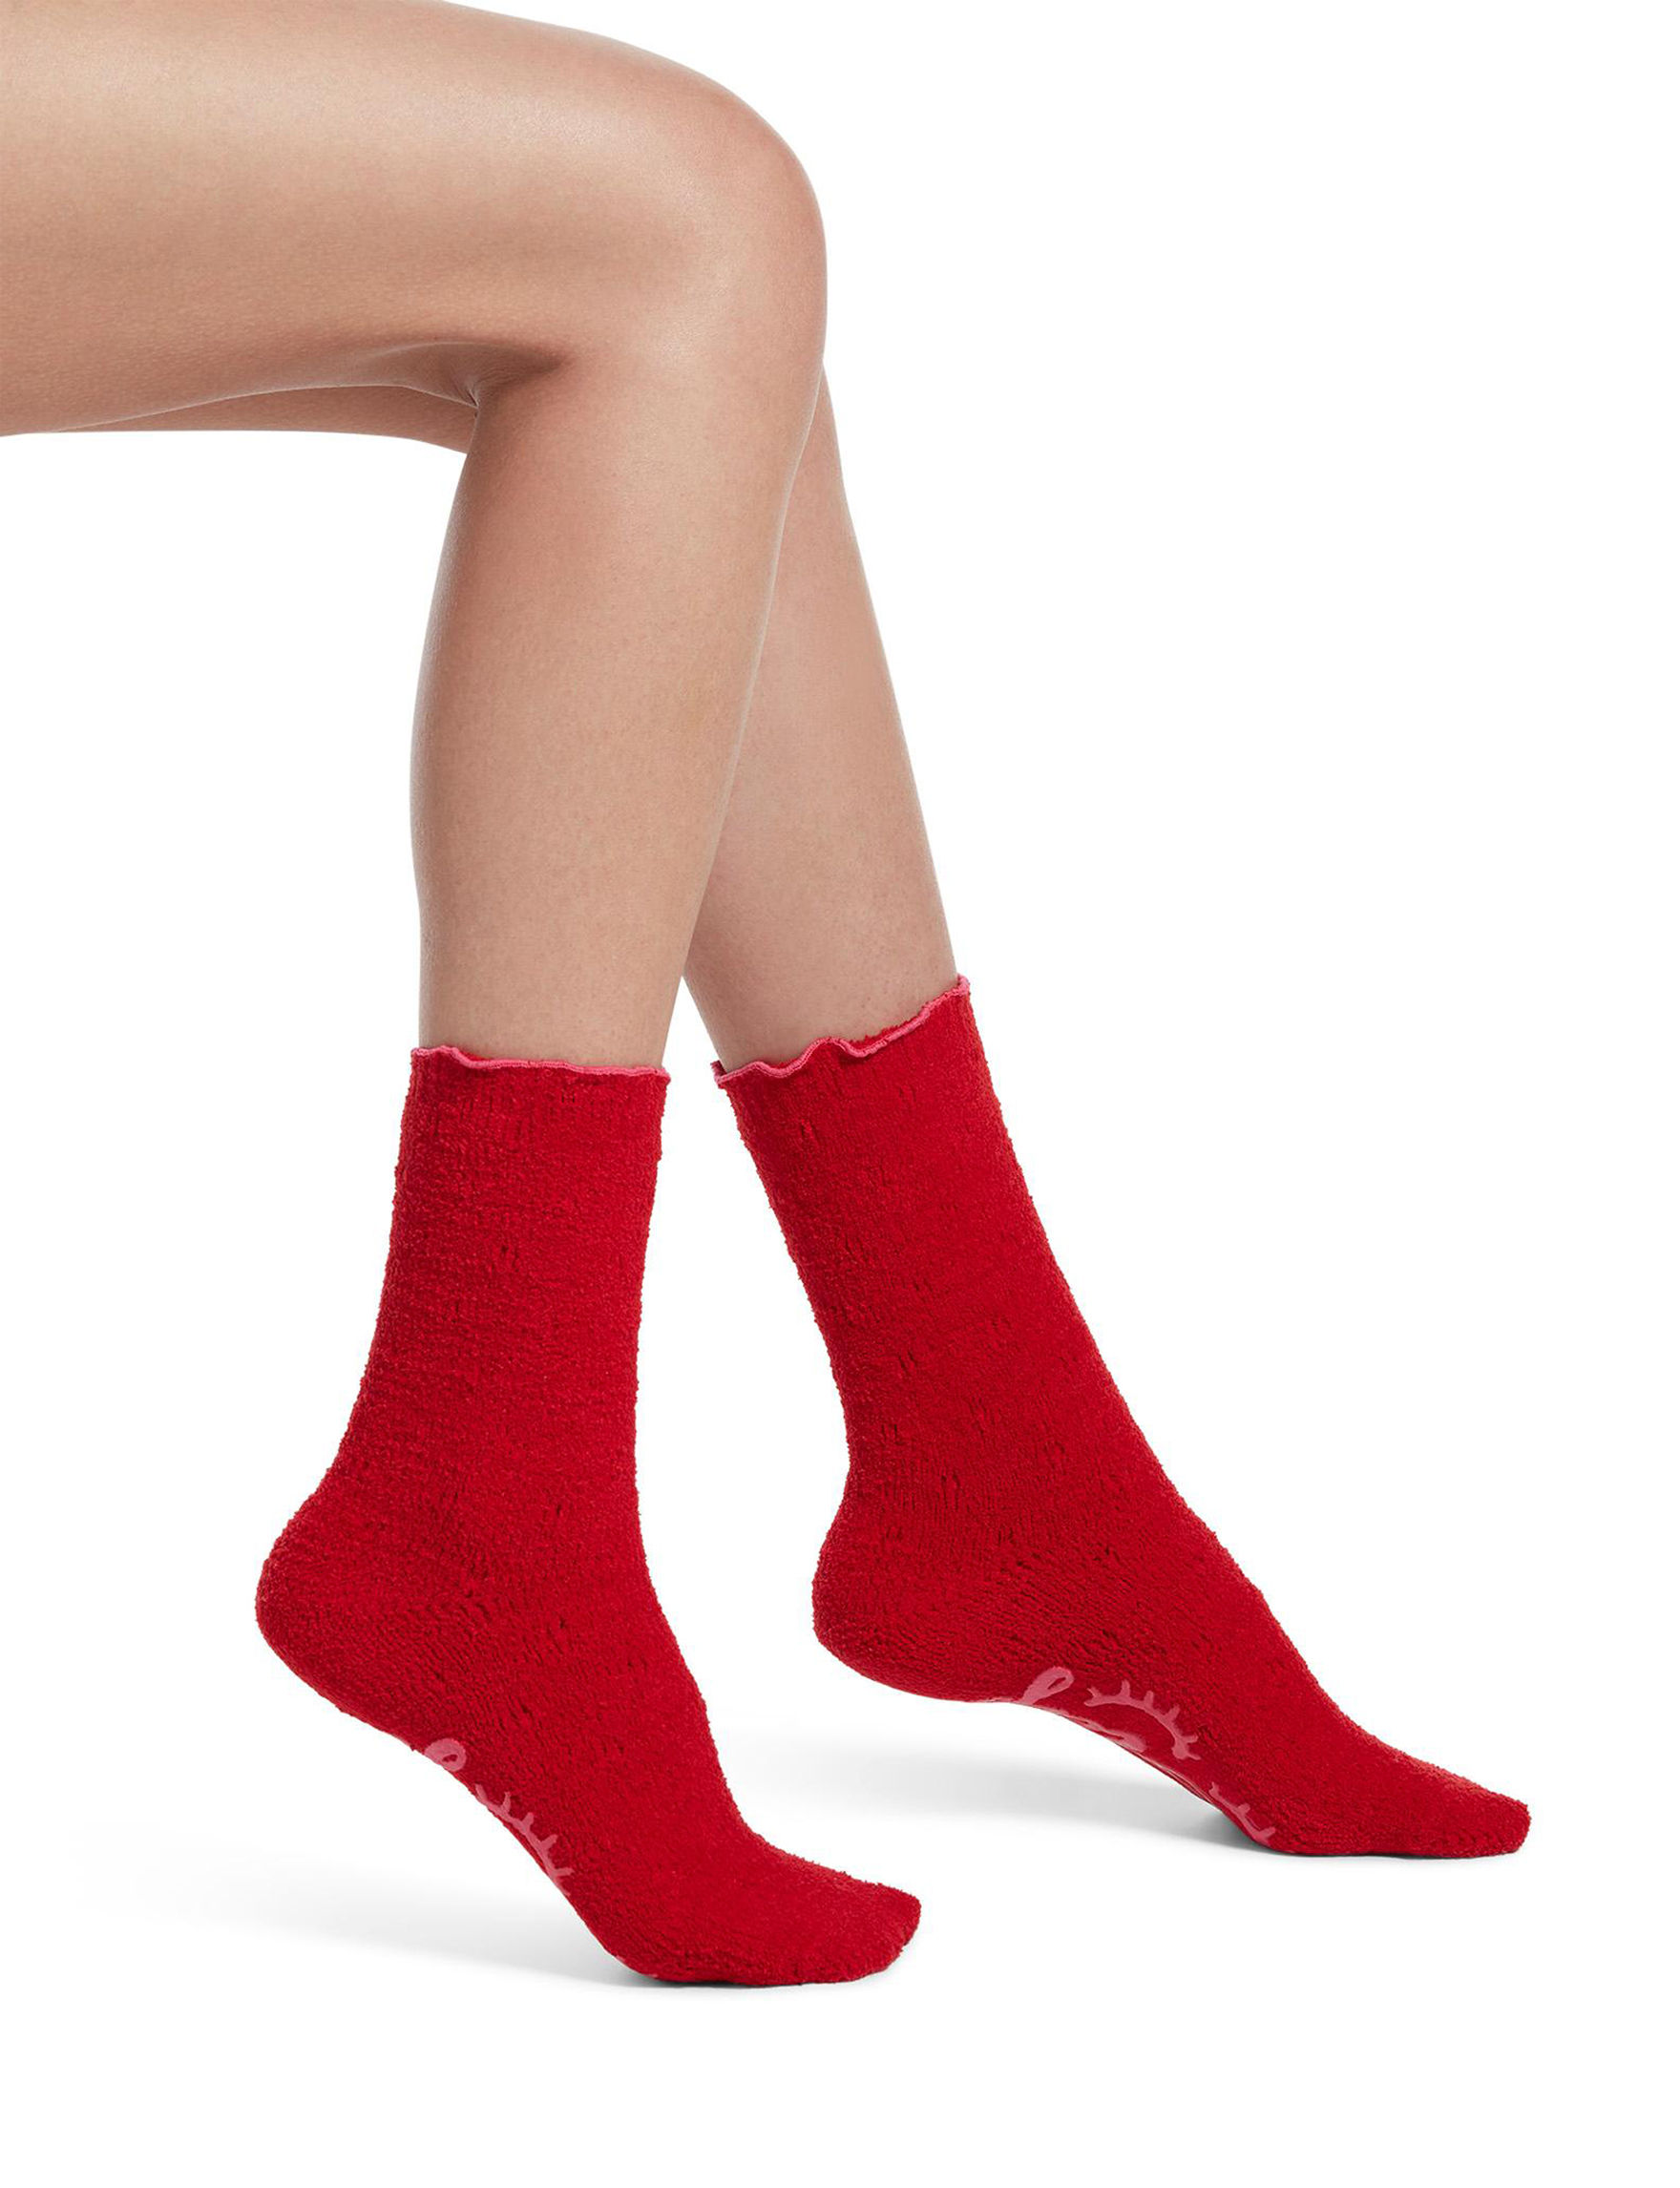 Hue Red Socks